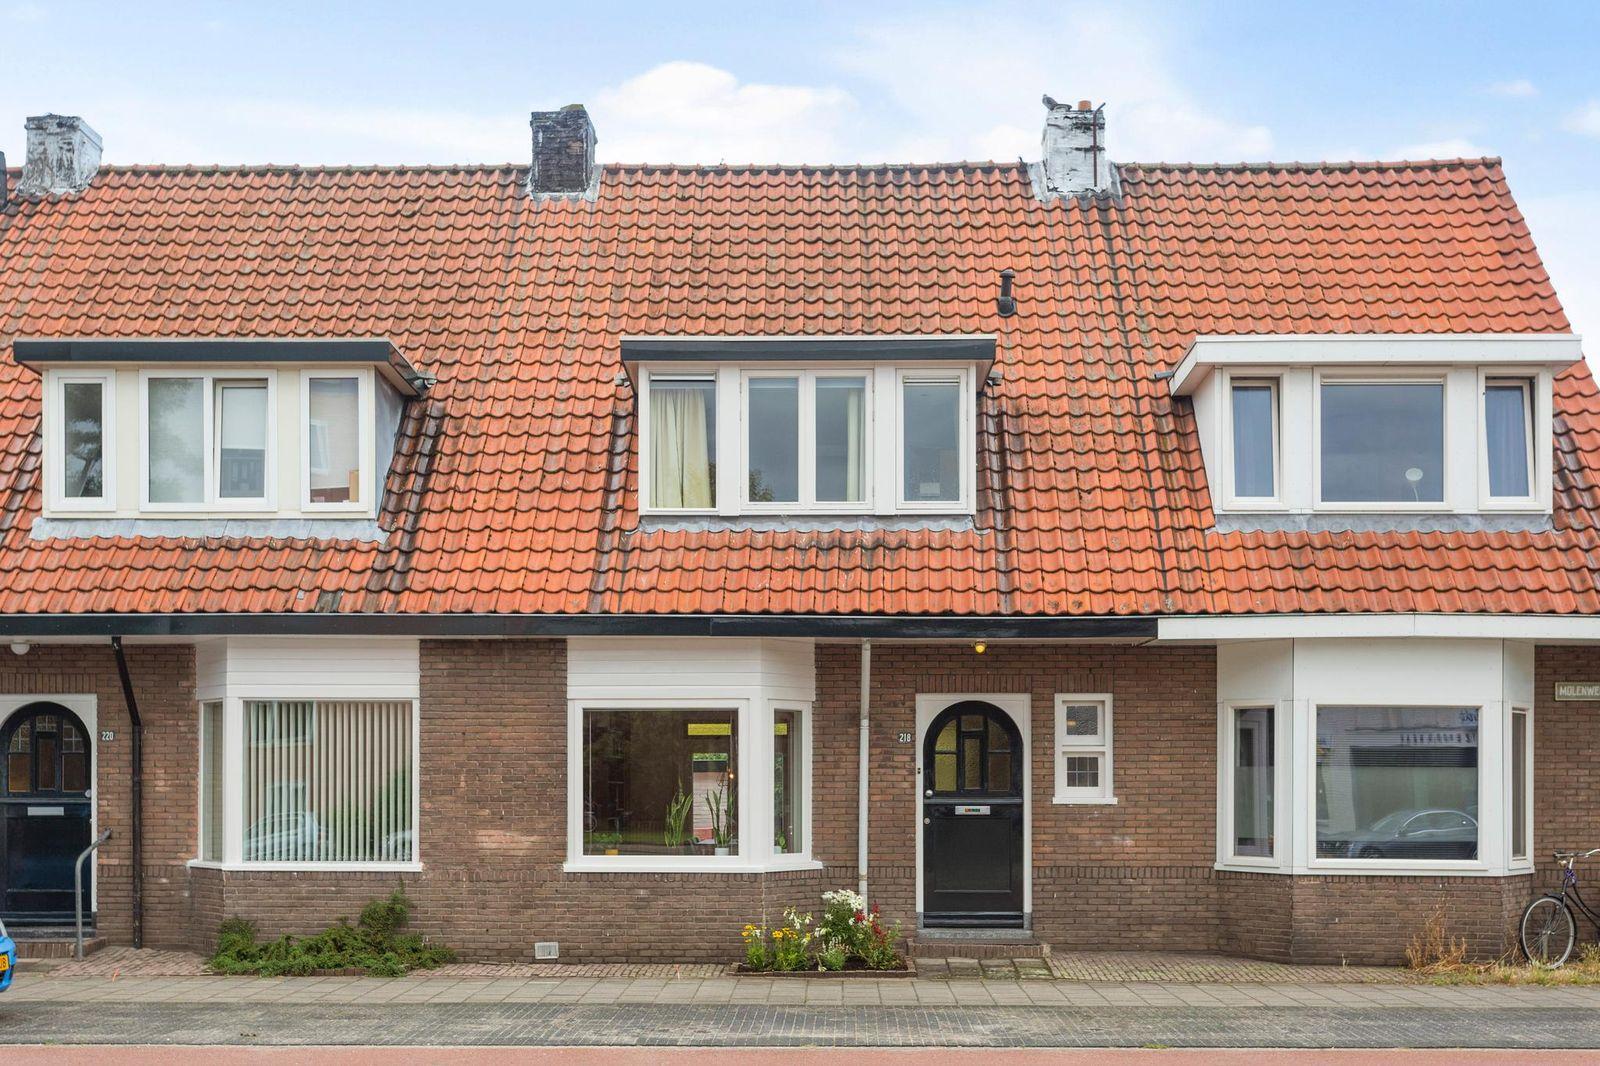 Molenweg 218, Nijmegen